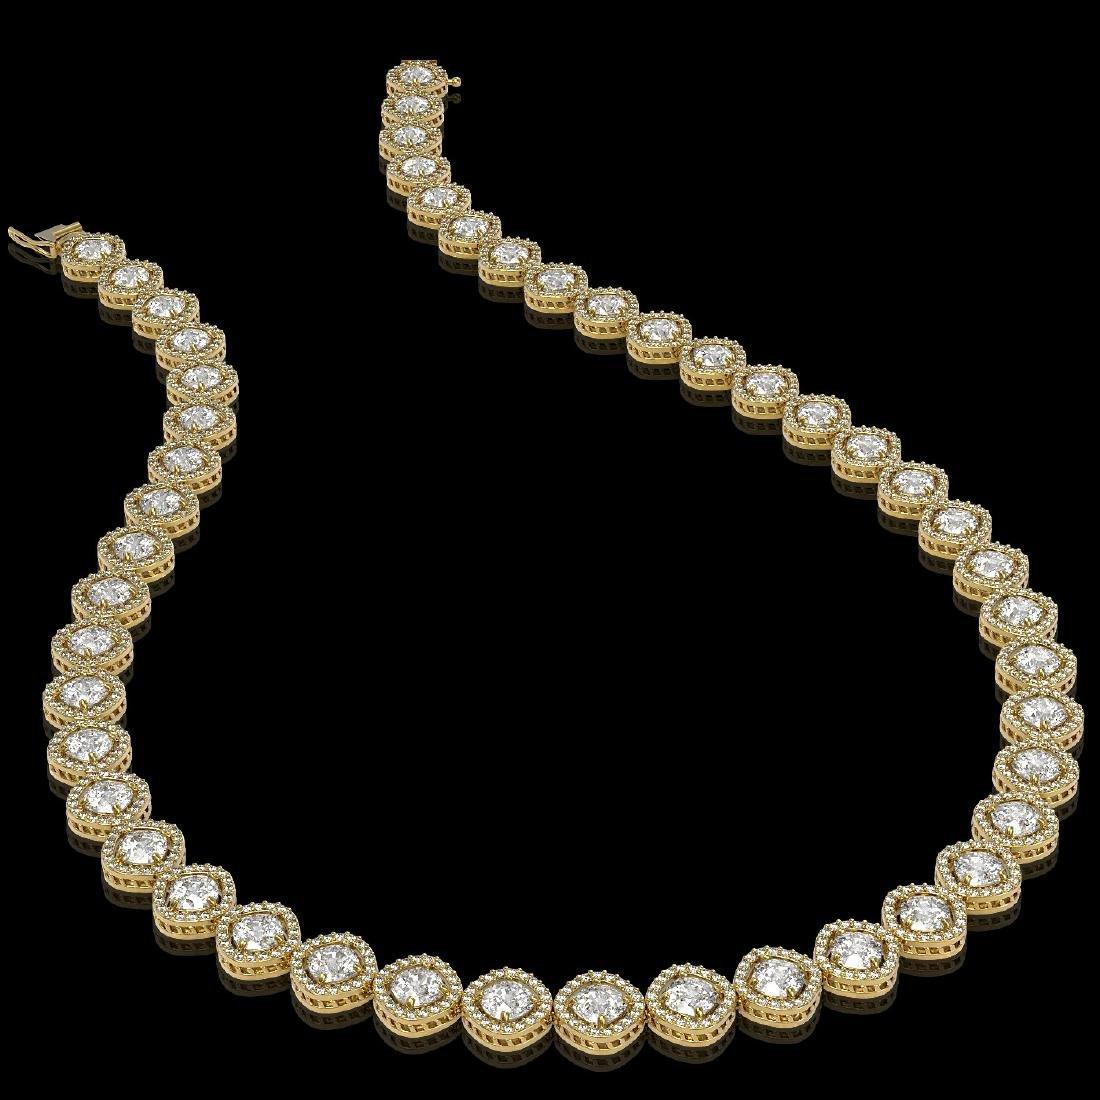 29.37 CTW Cushion Cut Diamond Designer Necklace 18K - 2